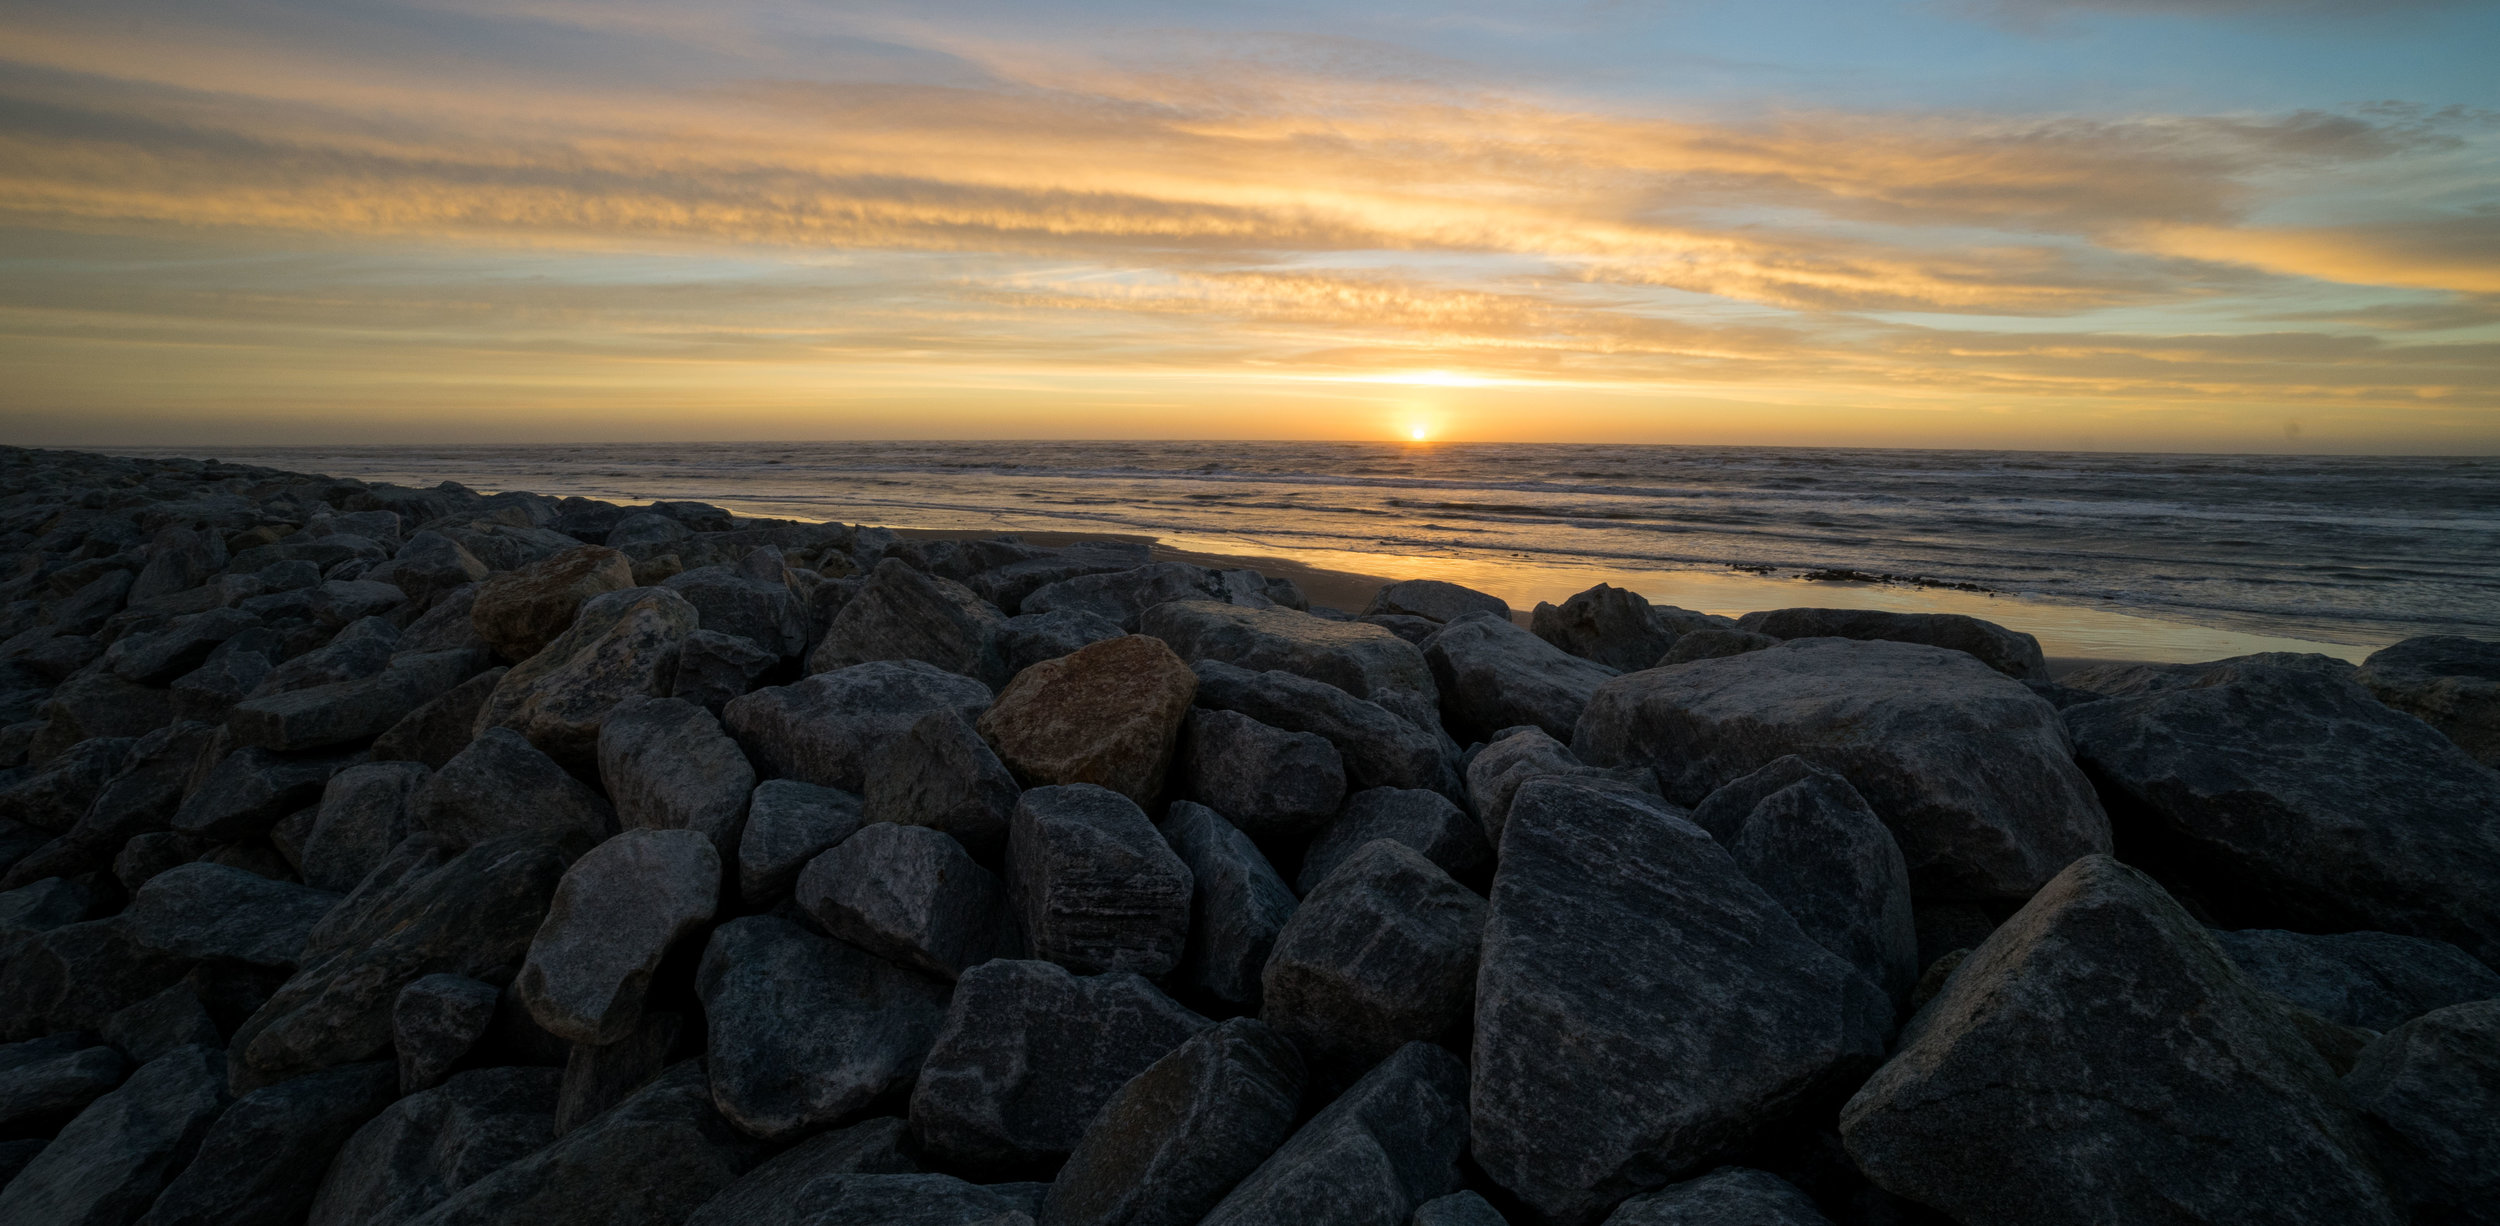 The sea wall, just like the coast, is gradually wearing away.